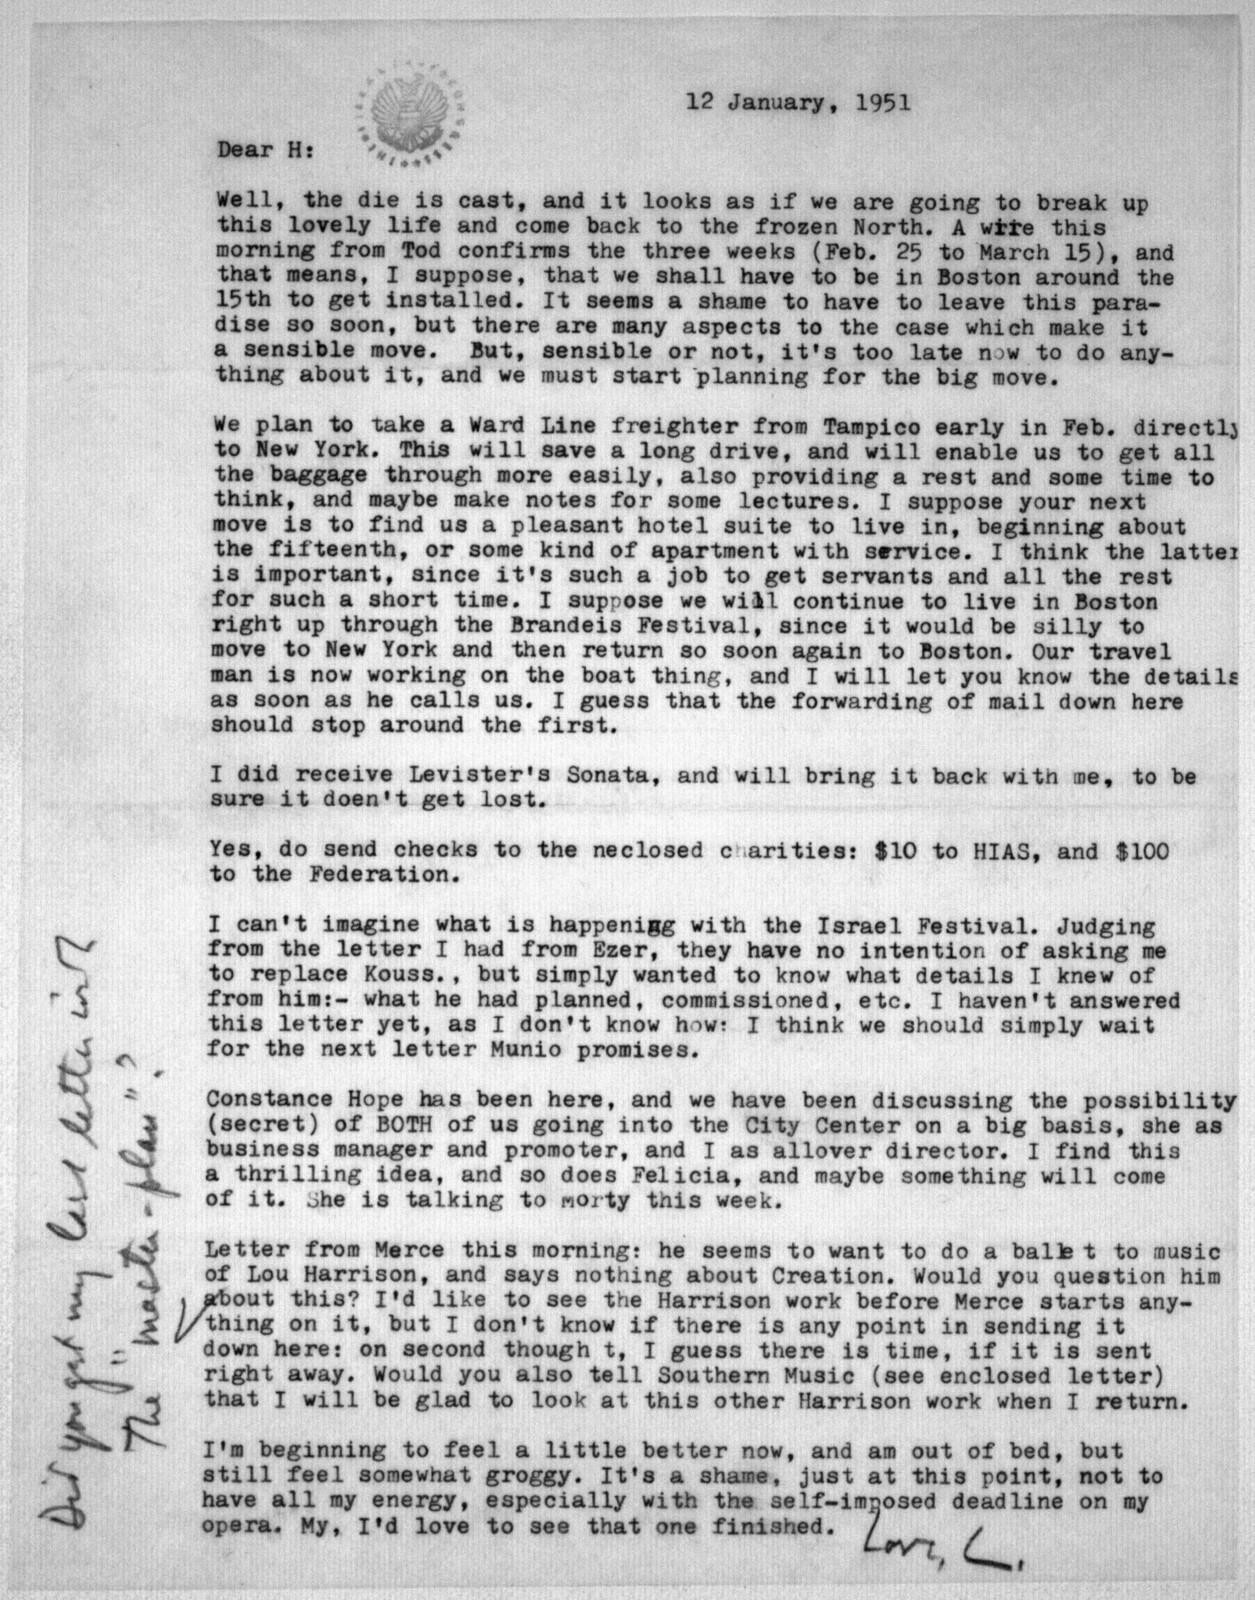 Letter from Leonard Bernstein to Helen Coates, January 12, 1951